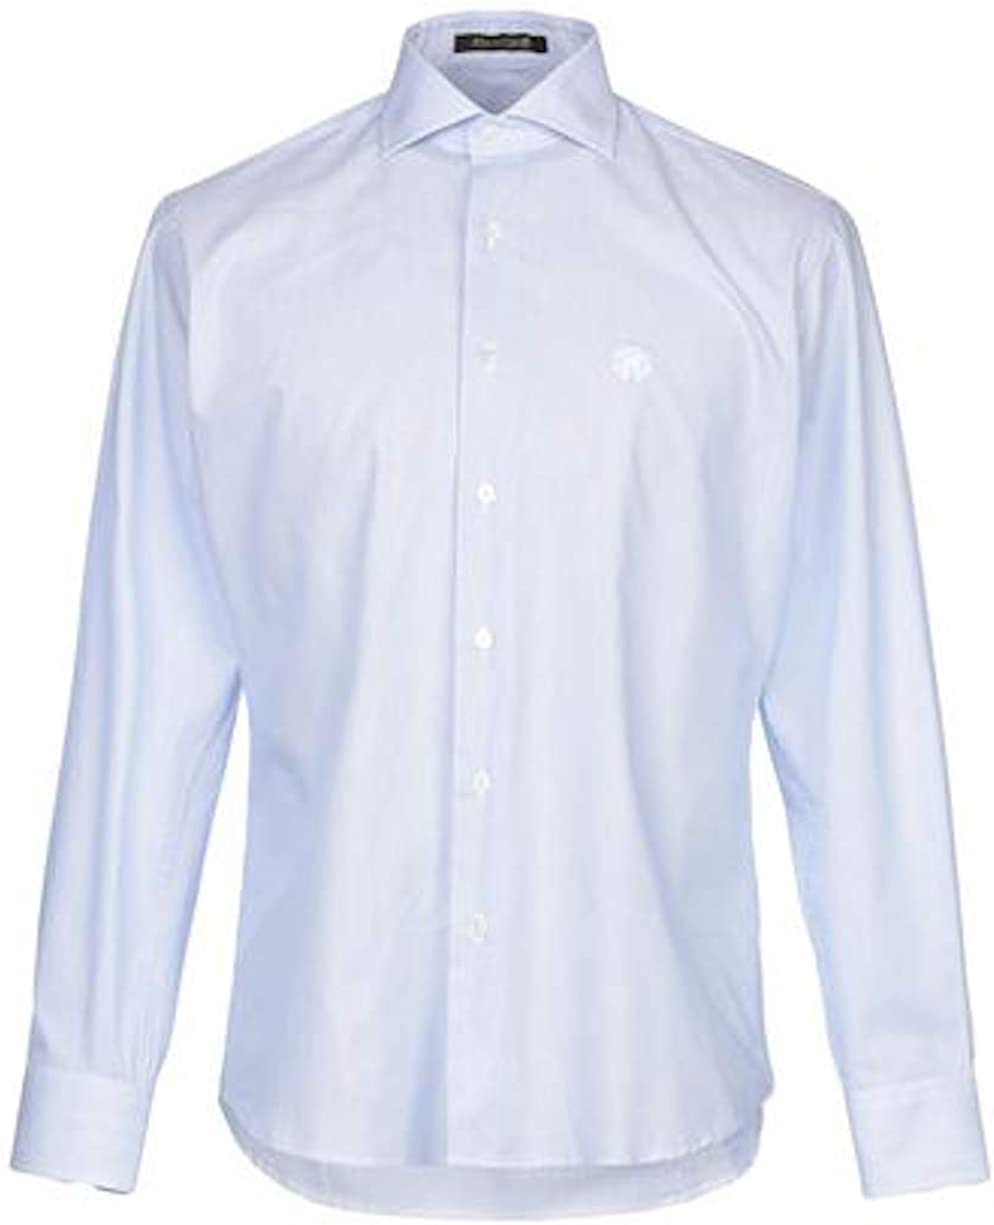 ROBERTO CAVALLI Camicia Blue Stripe Slim Fit Dress Shirt 16 1/2 (42)